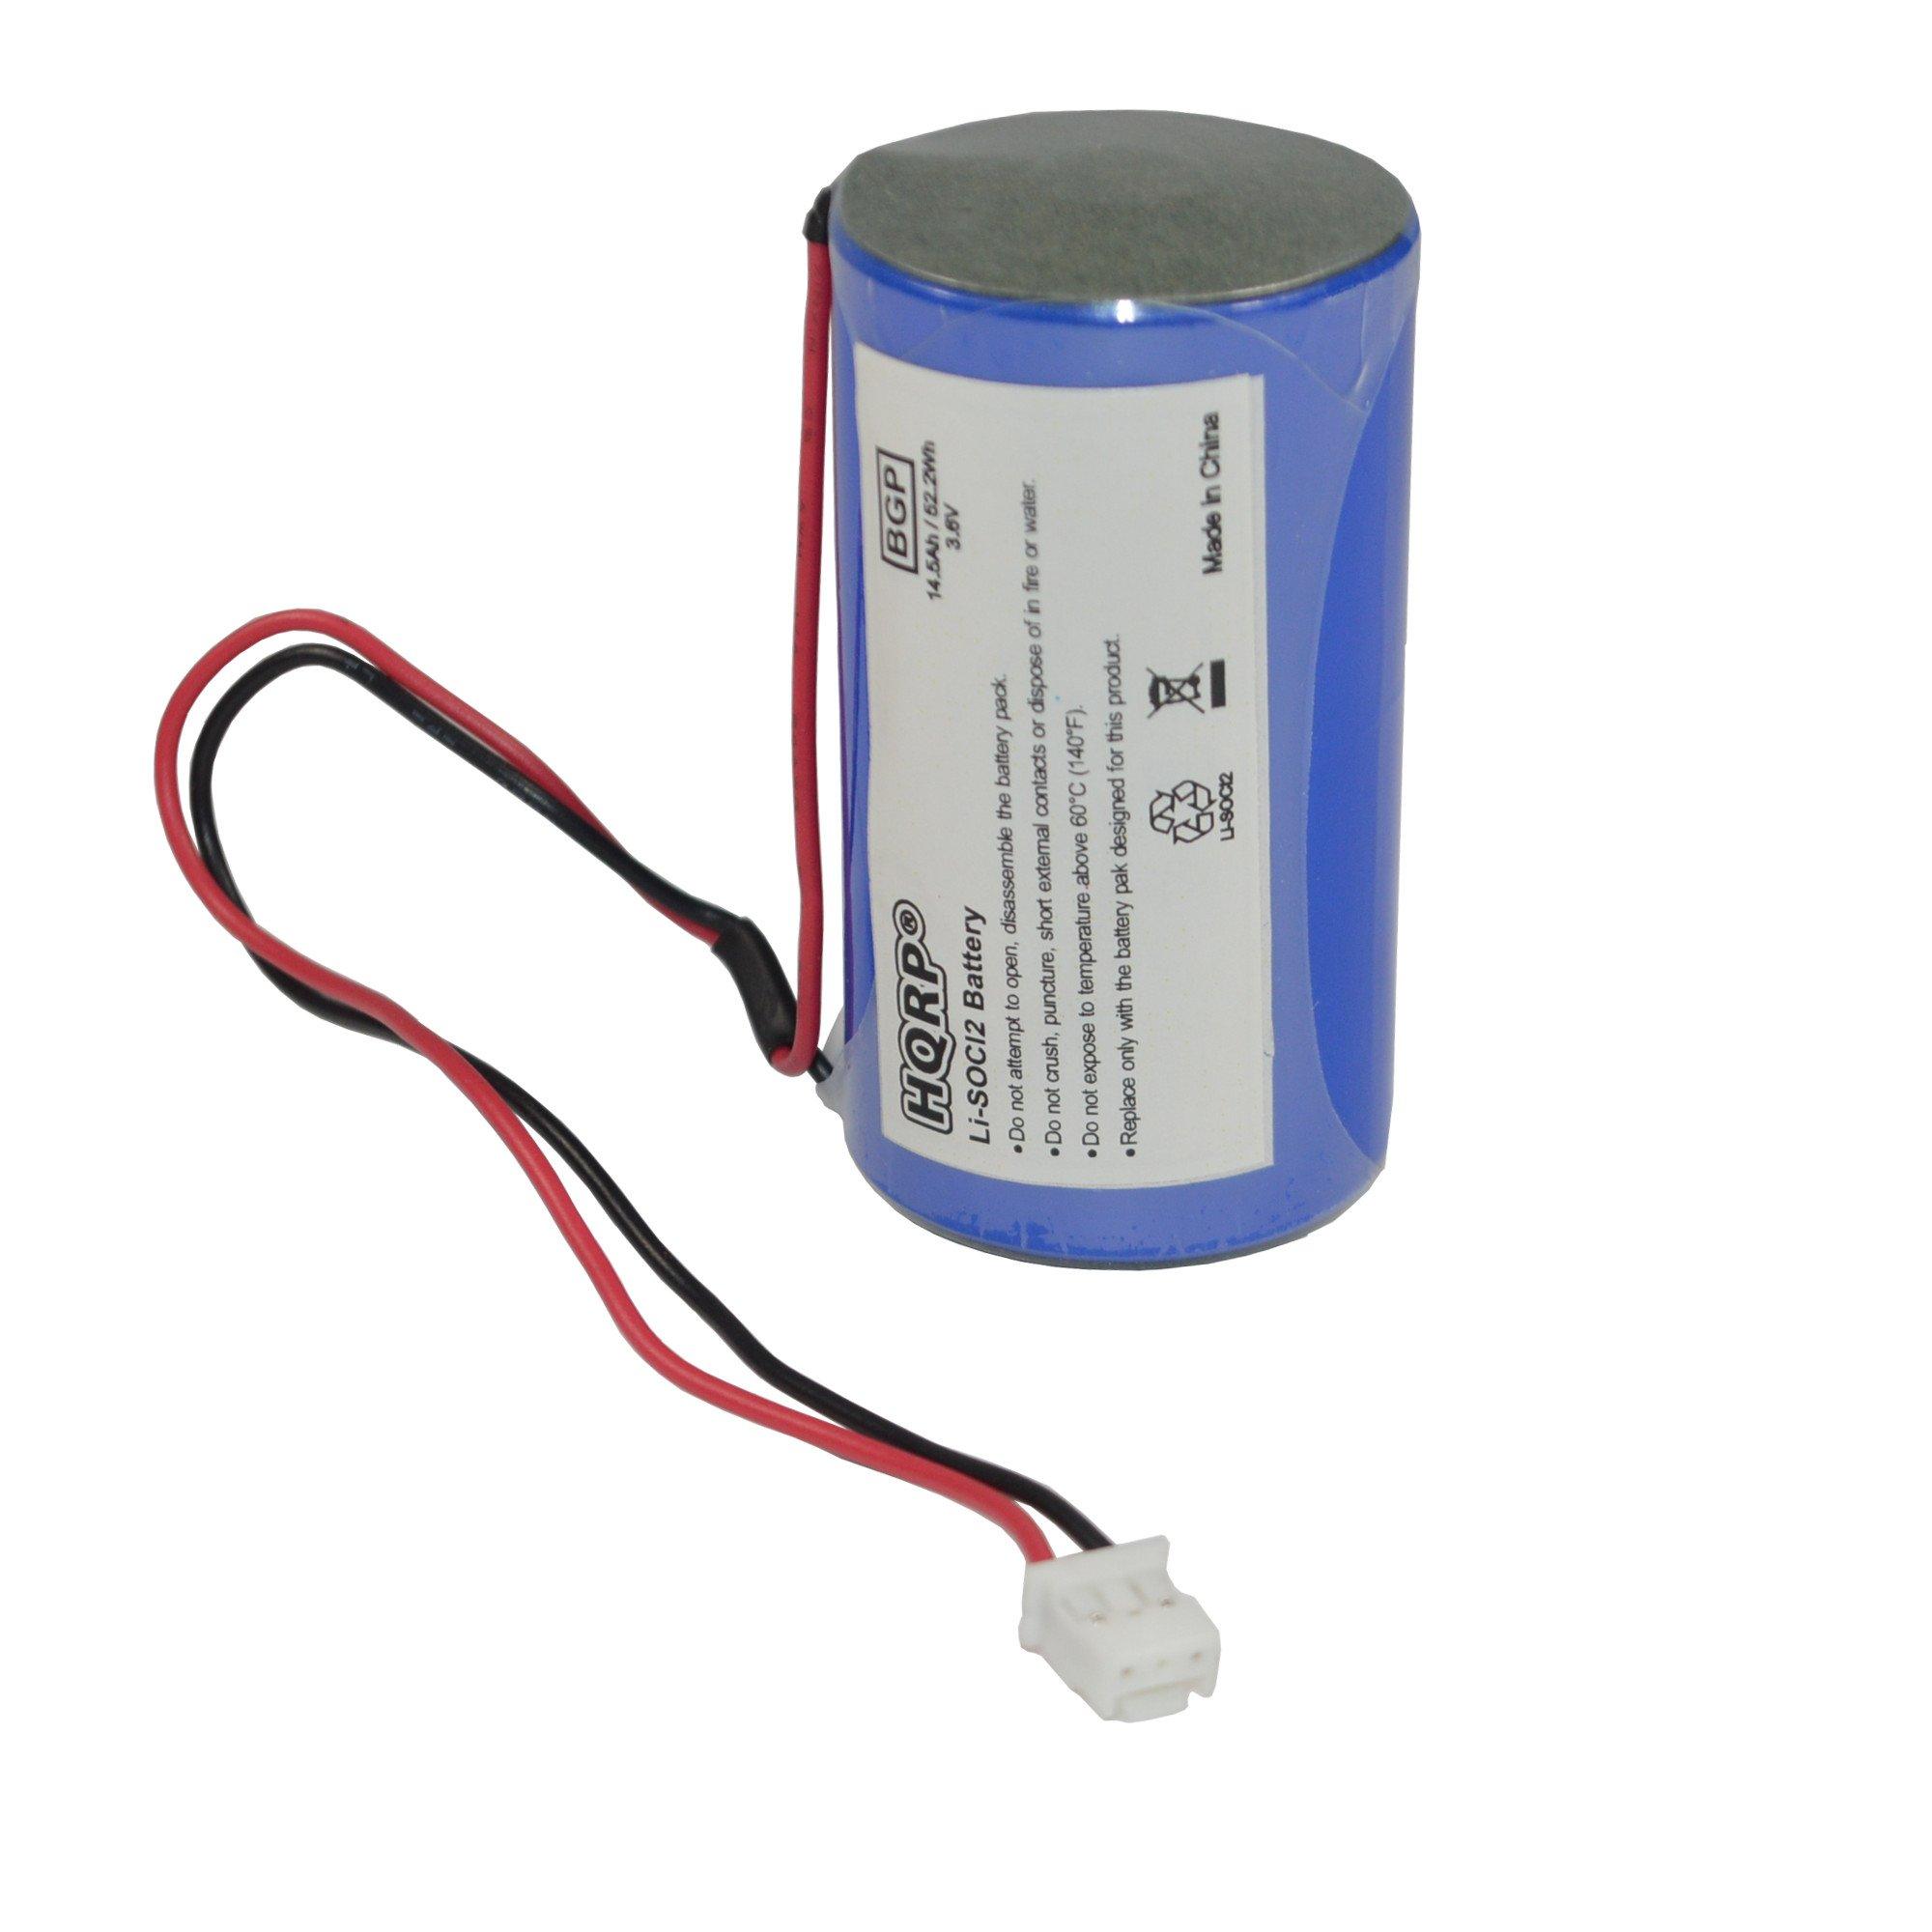 HQRP D-Size 3.6V Lithium Thionyl Chloride Battery Compatible with DSC ER34615M-T1 WT4911 WT4911B WT8911 ALEXOR Wireless Outdoor Siren WT4911BATT ADT by HQRP